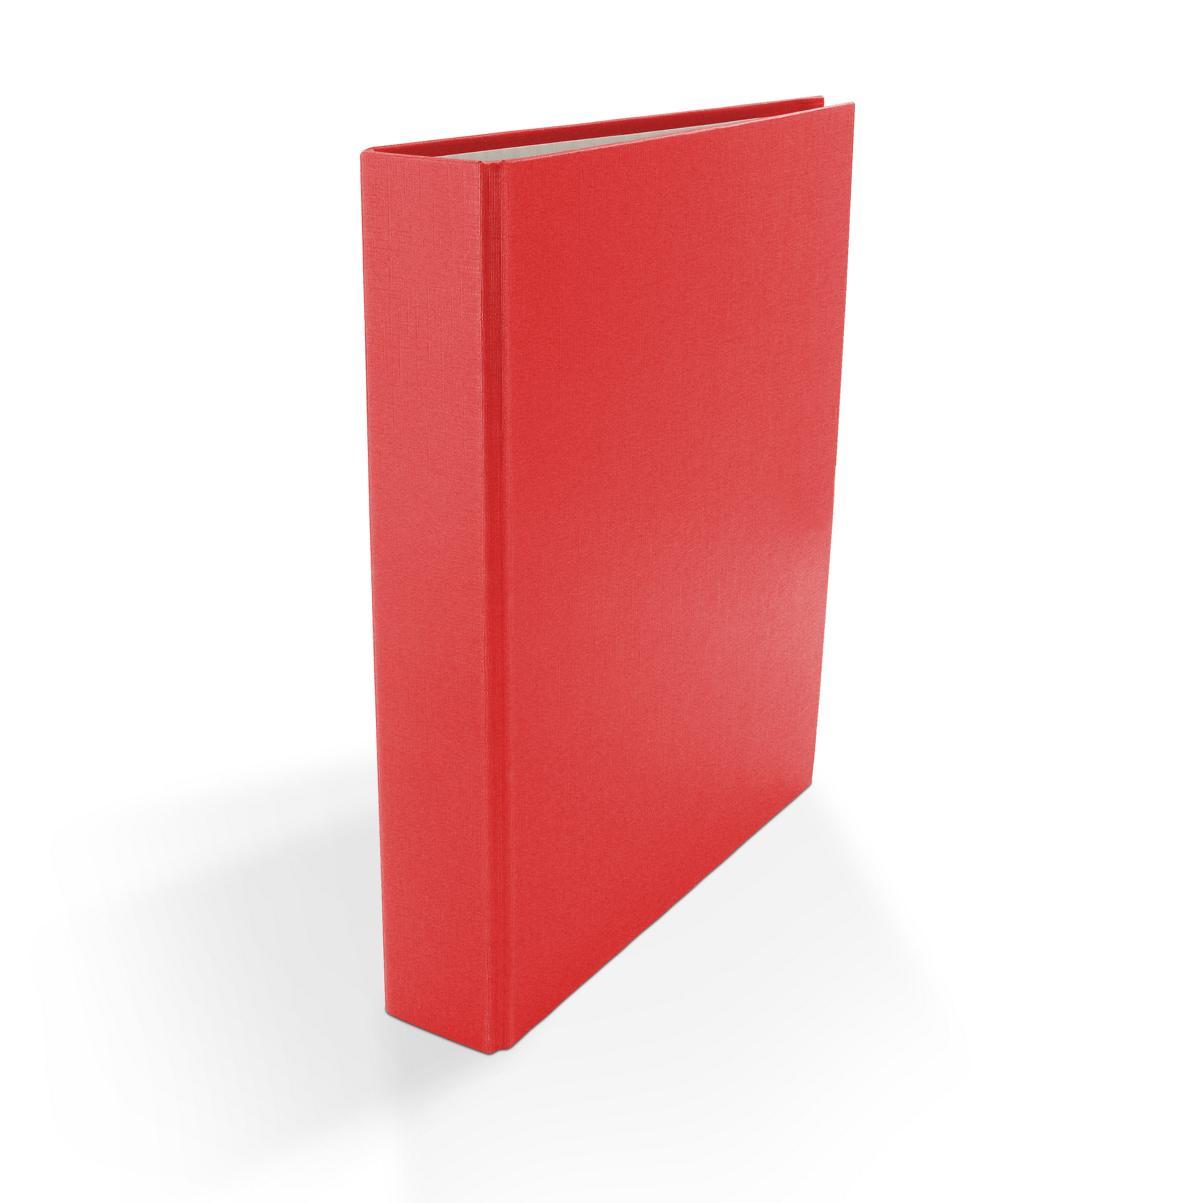 je 1x weiß Farbe 3x Ringbuch DIN A5 2-Ring Ordner rot und schwarz